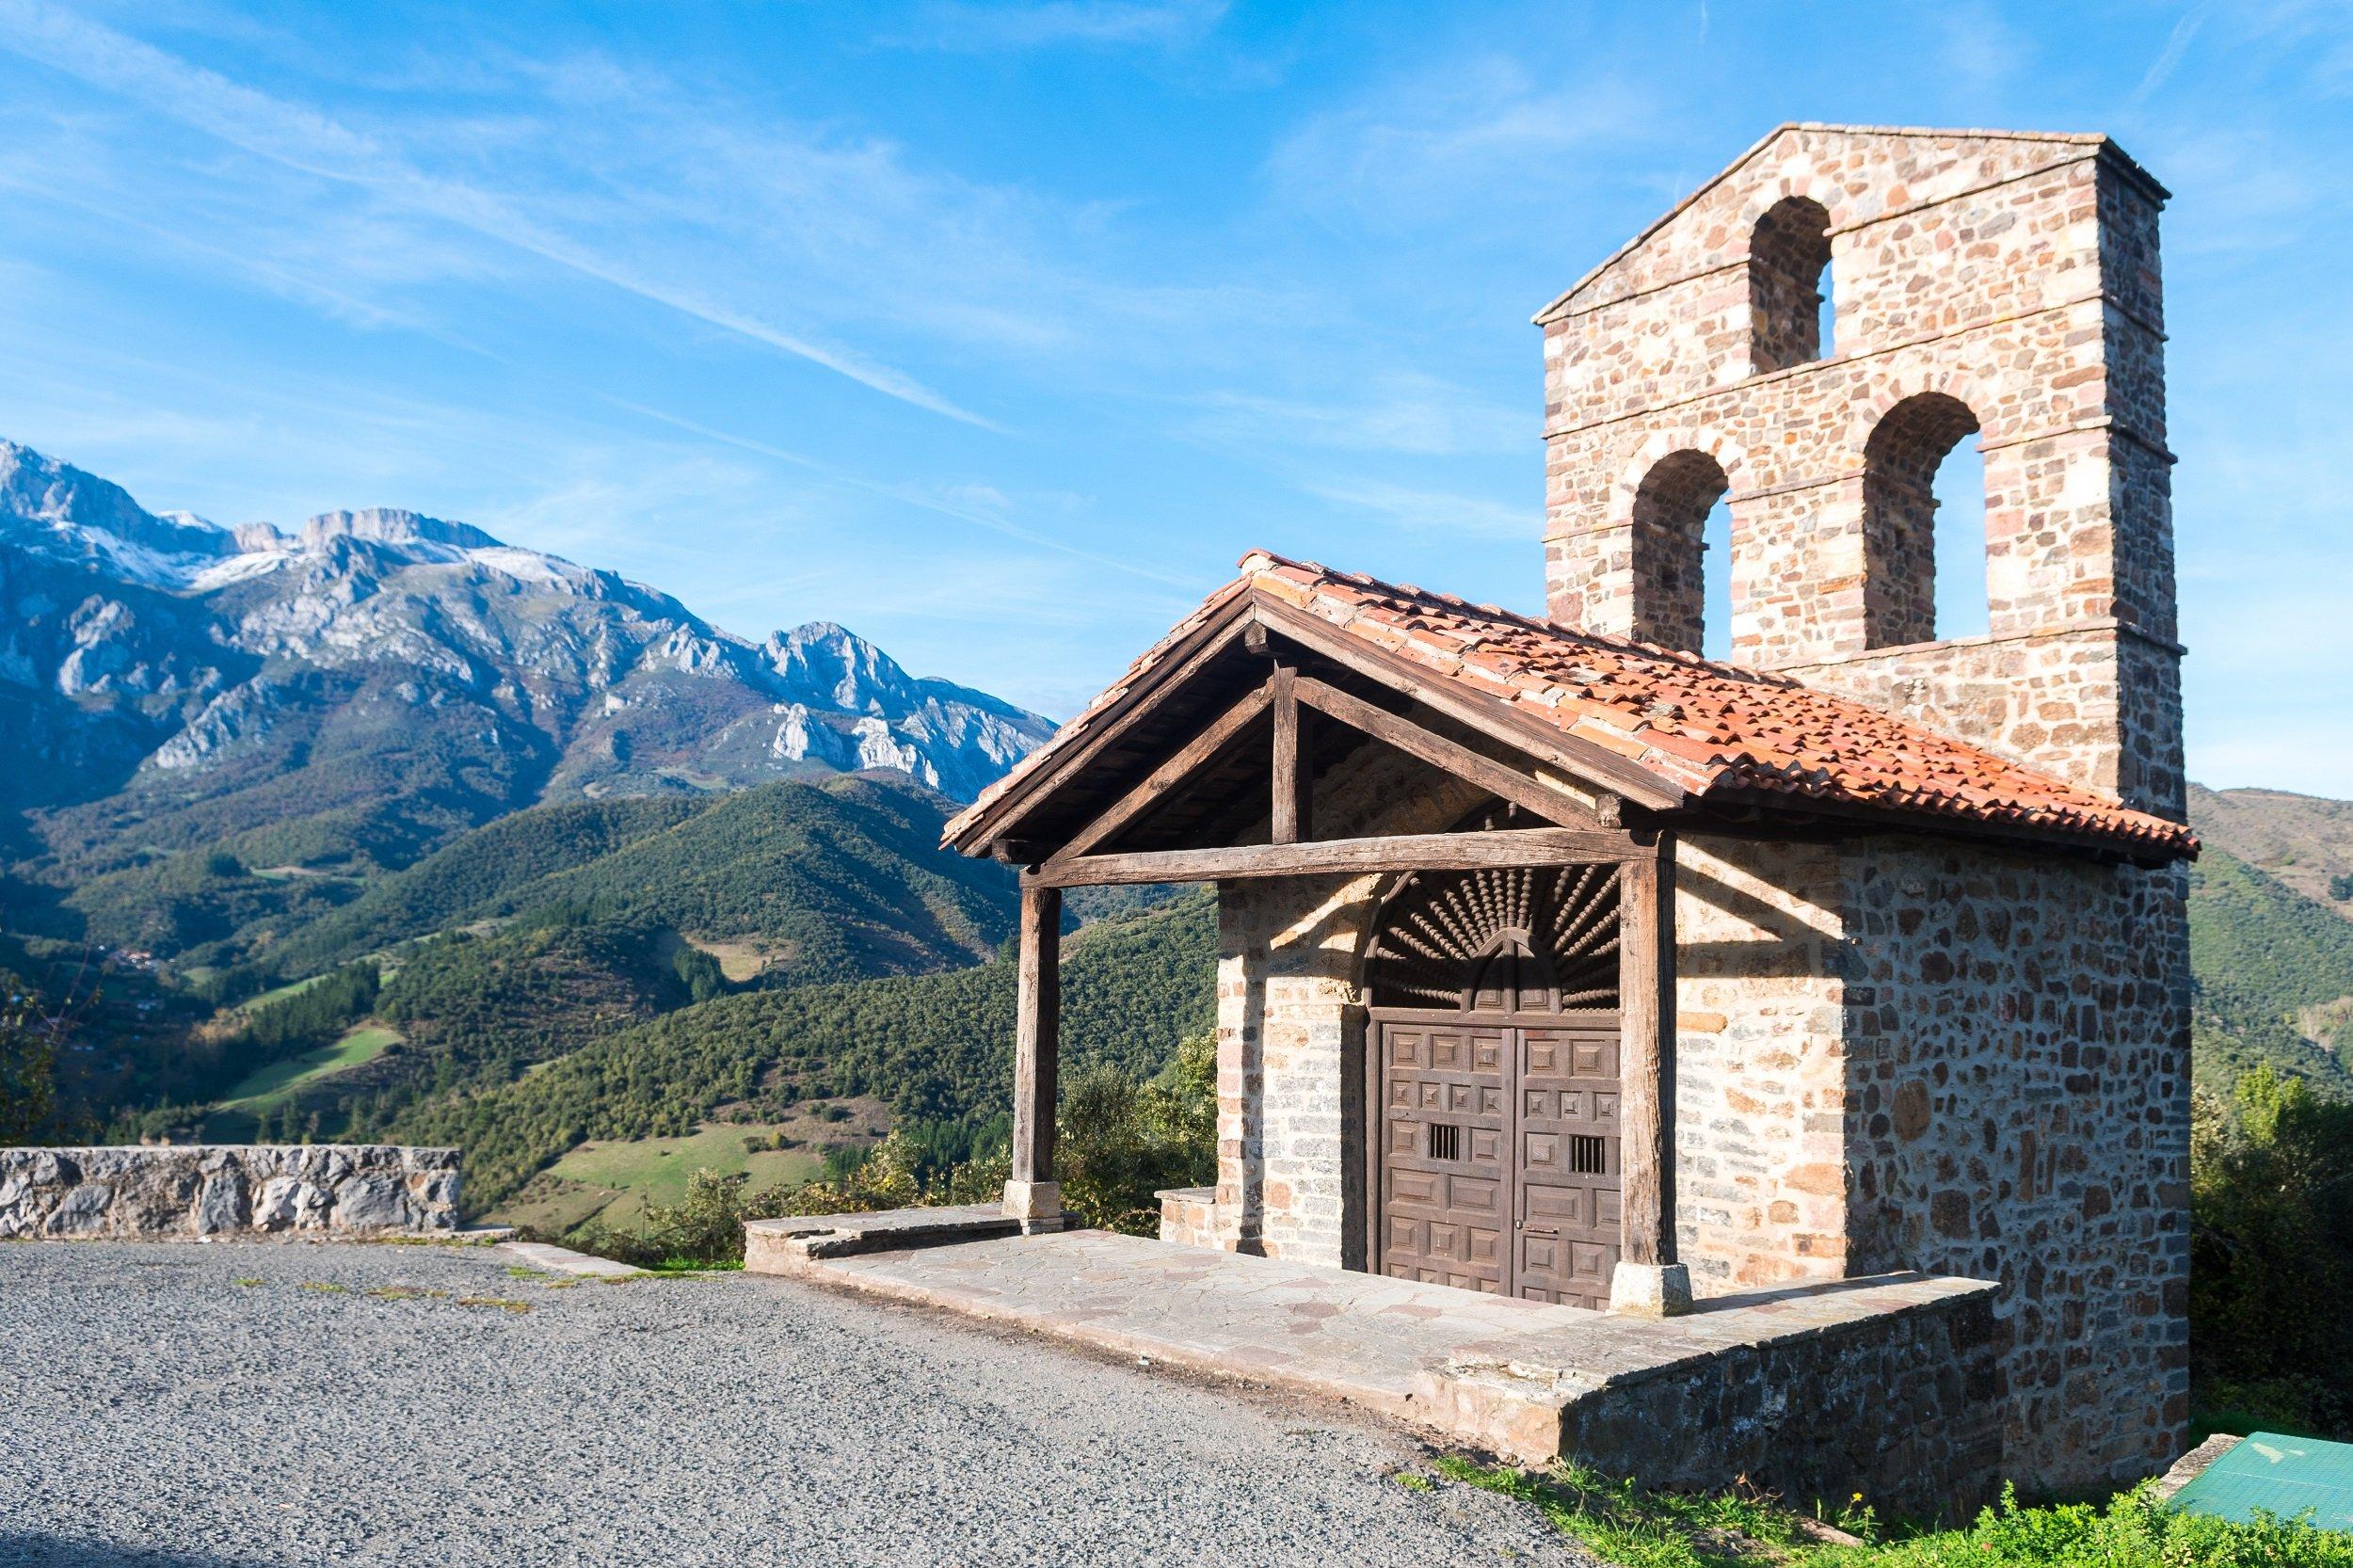 Monastery Of Santo Toribio & San Sebastián De Garabandal Pilgrimage Tour From Santander, Torrelavega & Unquera